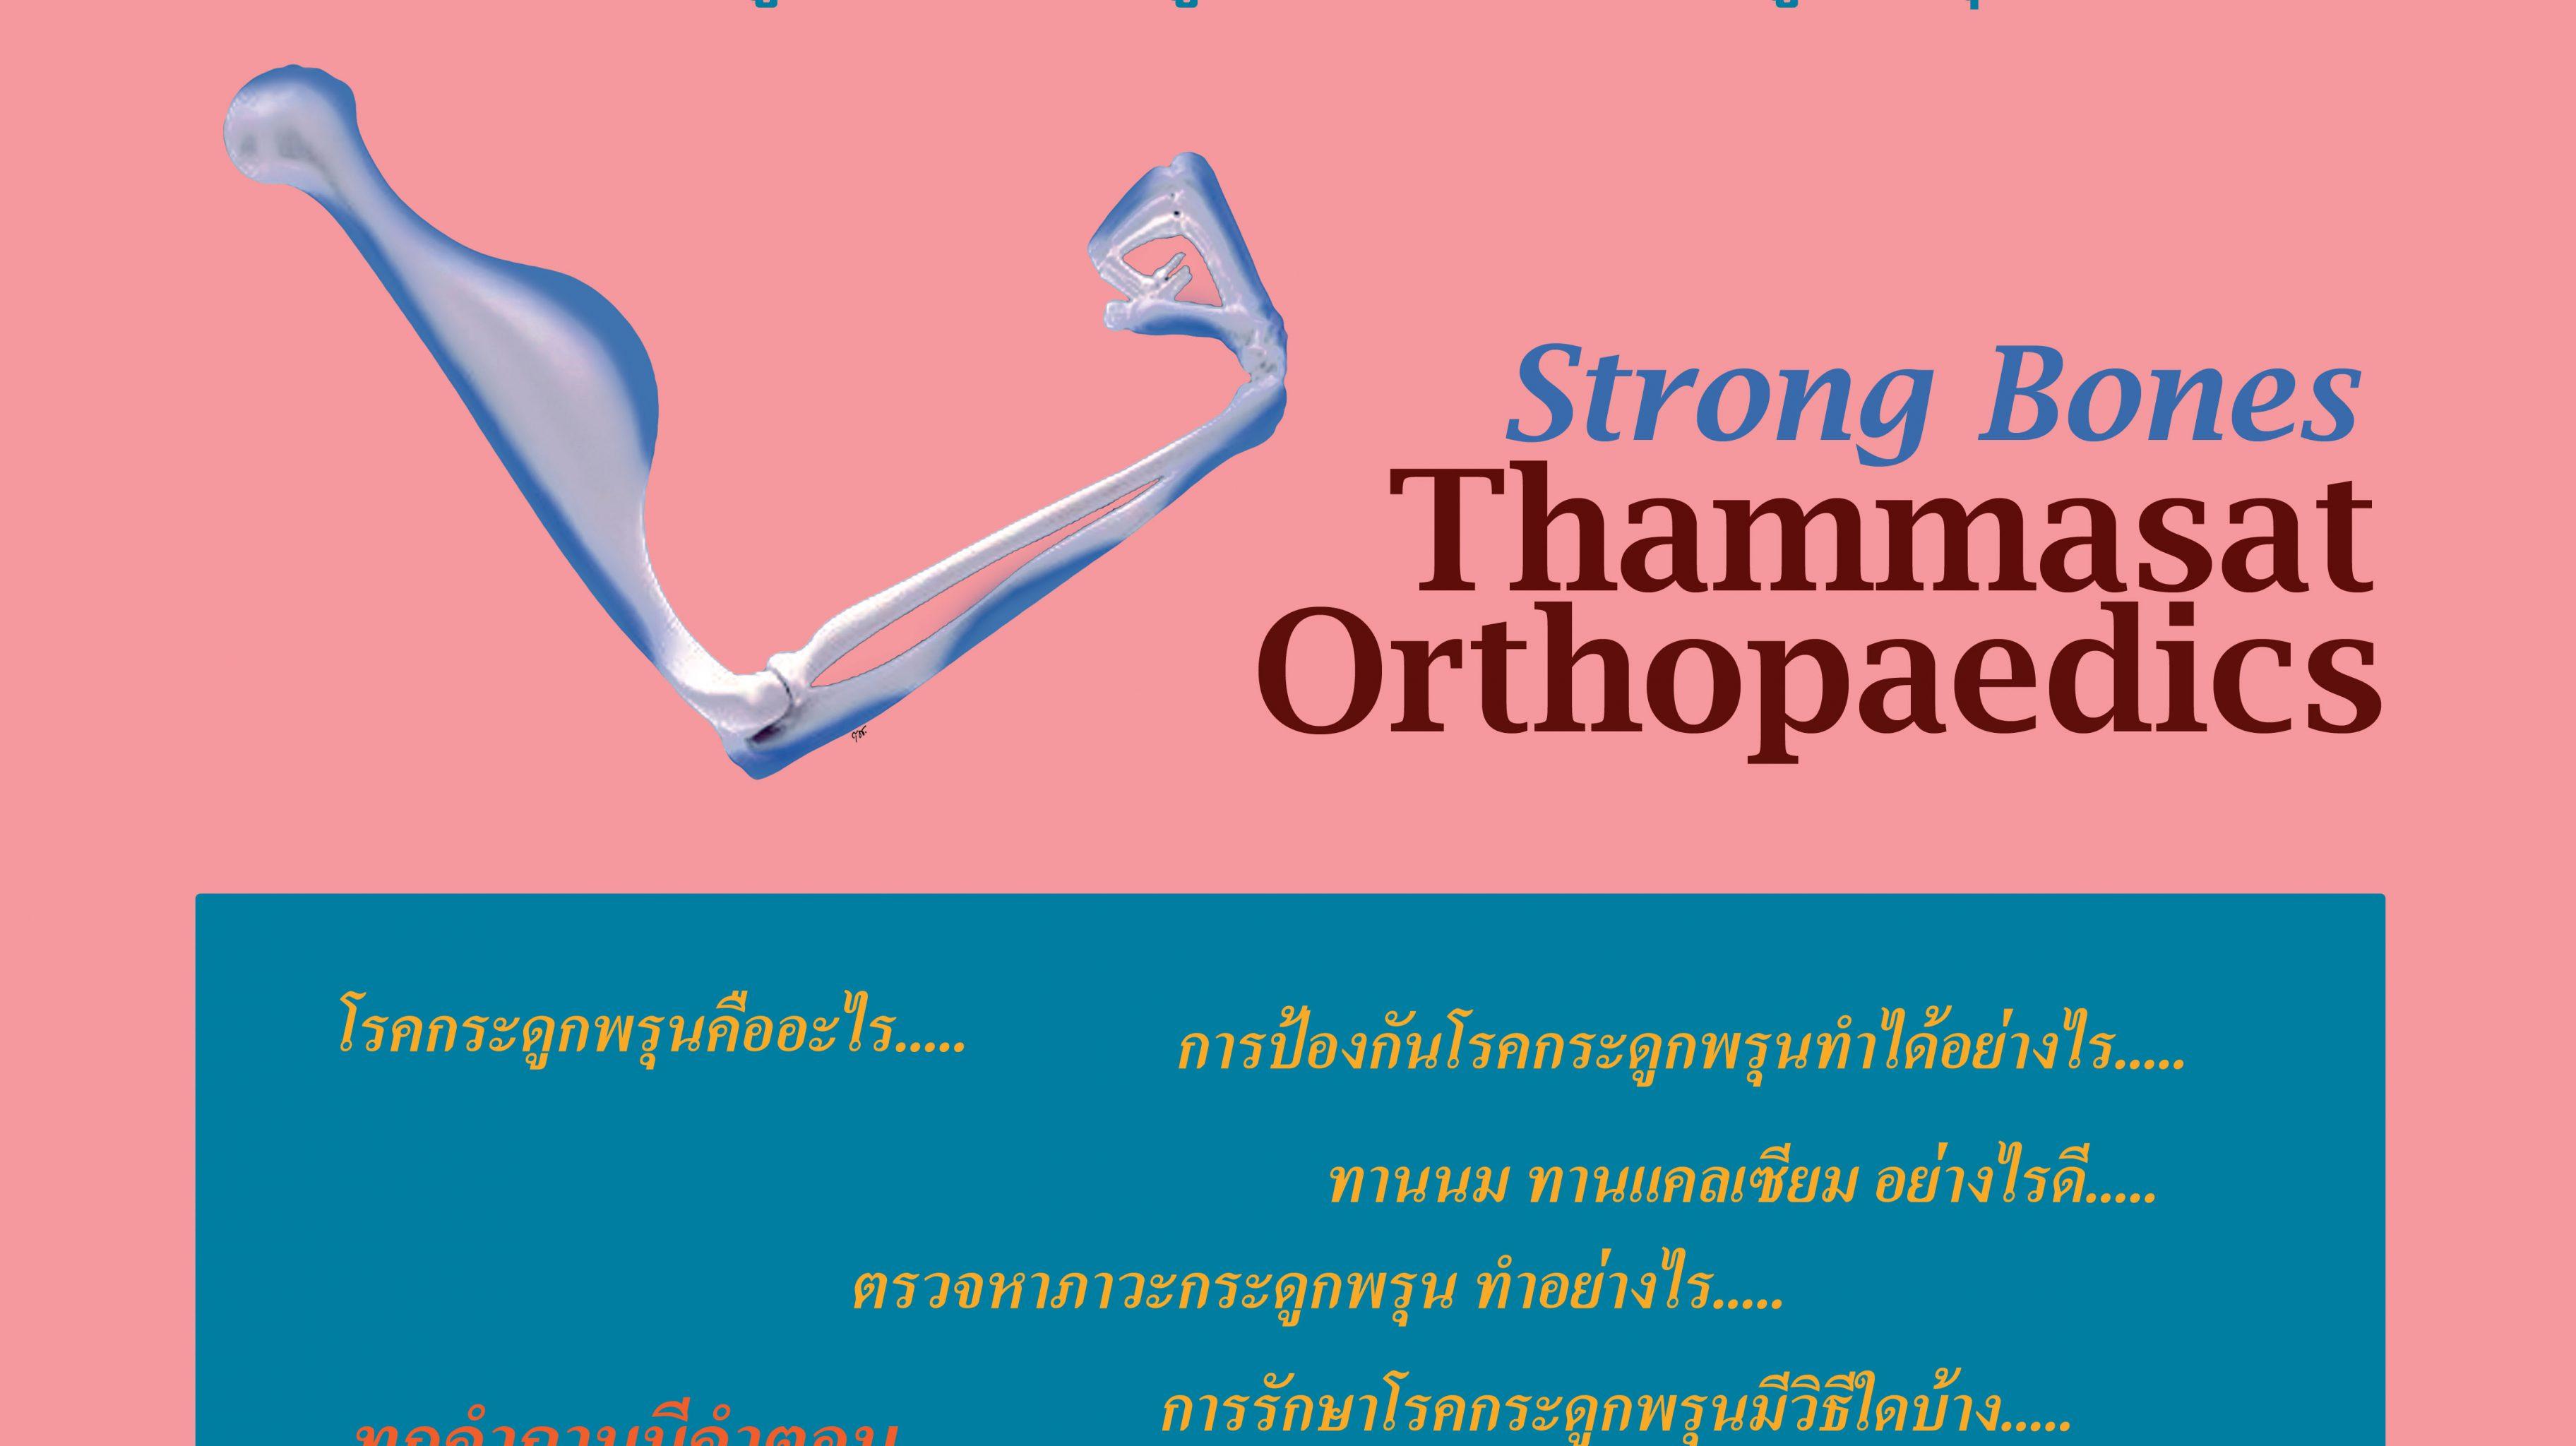 strongbone draft poster1